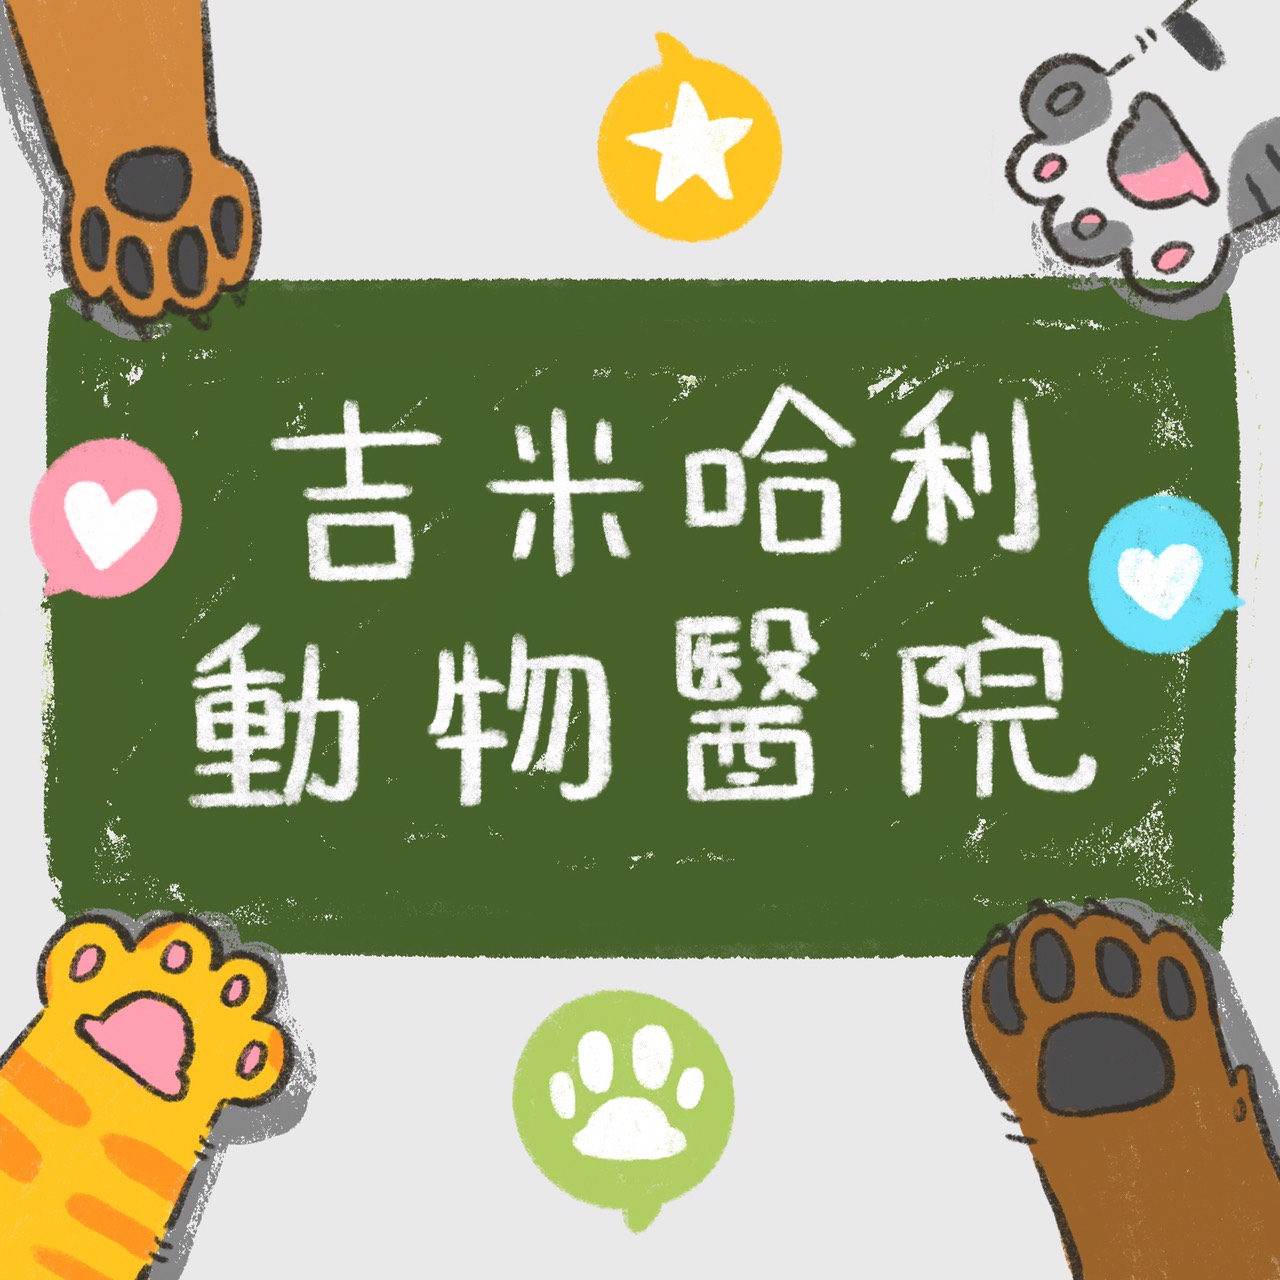 EP4 20分鐘!讓你第一次奶貓就上手 幼貓除蚤 奶貓照顧必備指南 奶貓斷奶 多貓家庭 貓白血 貓愛滋